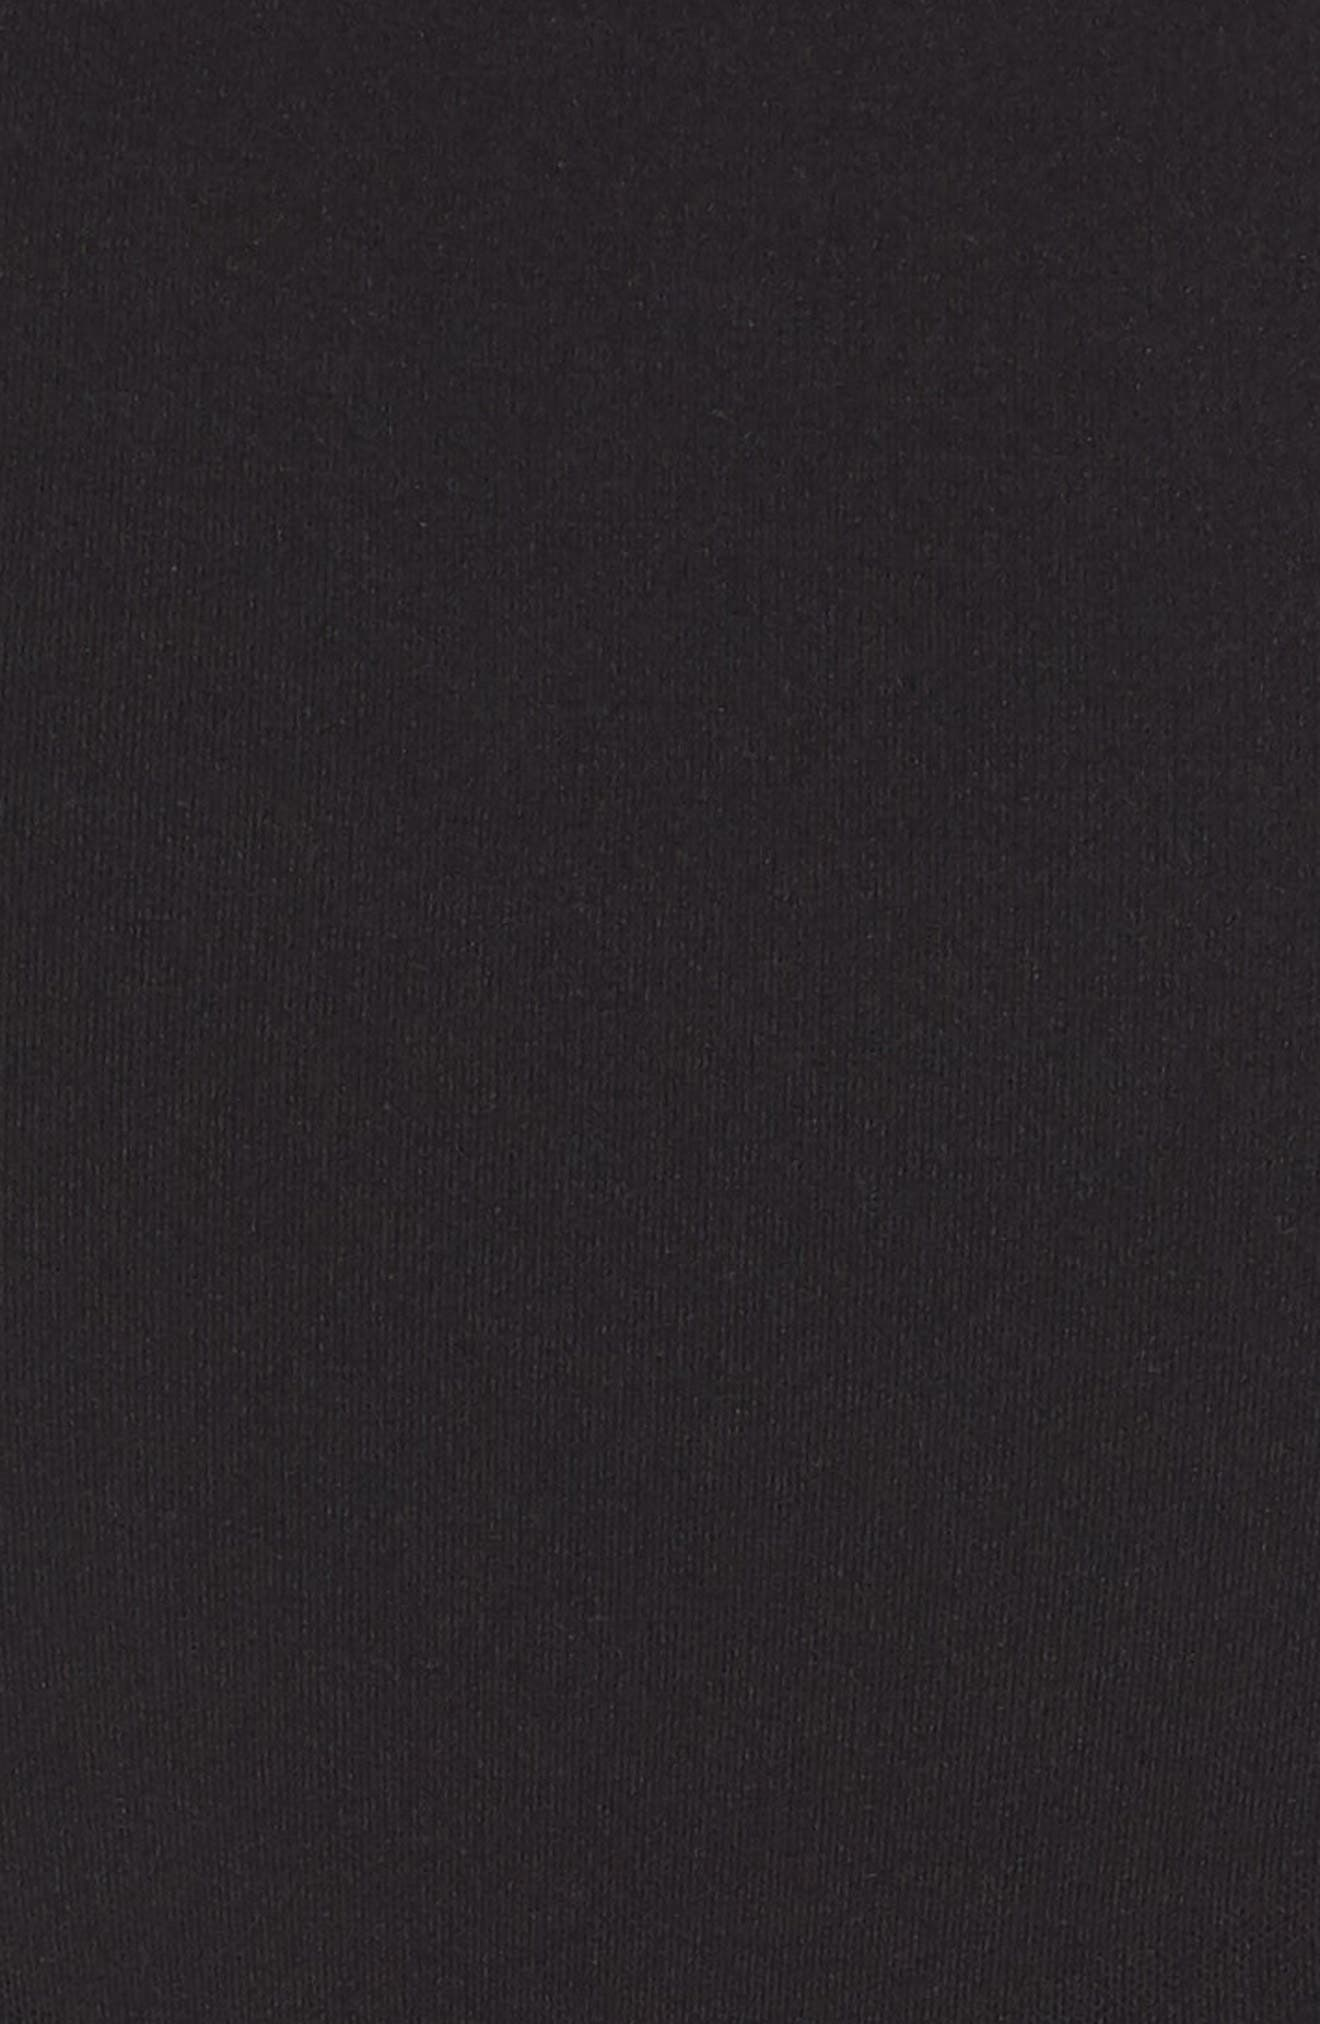 Power Short Mid Thigh Shaper,                             Alternate thumbnail 6, color,                             VERY BLACK